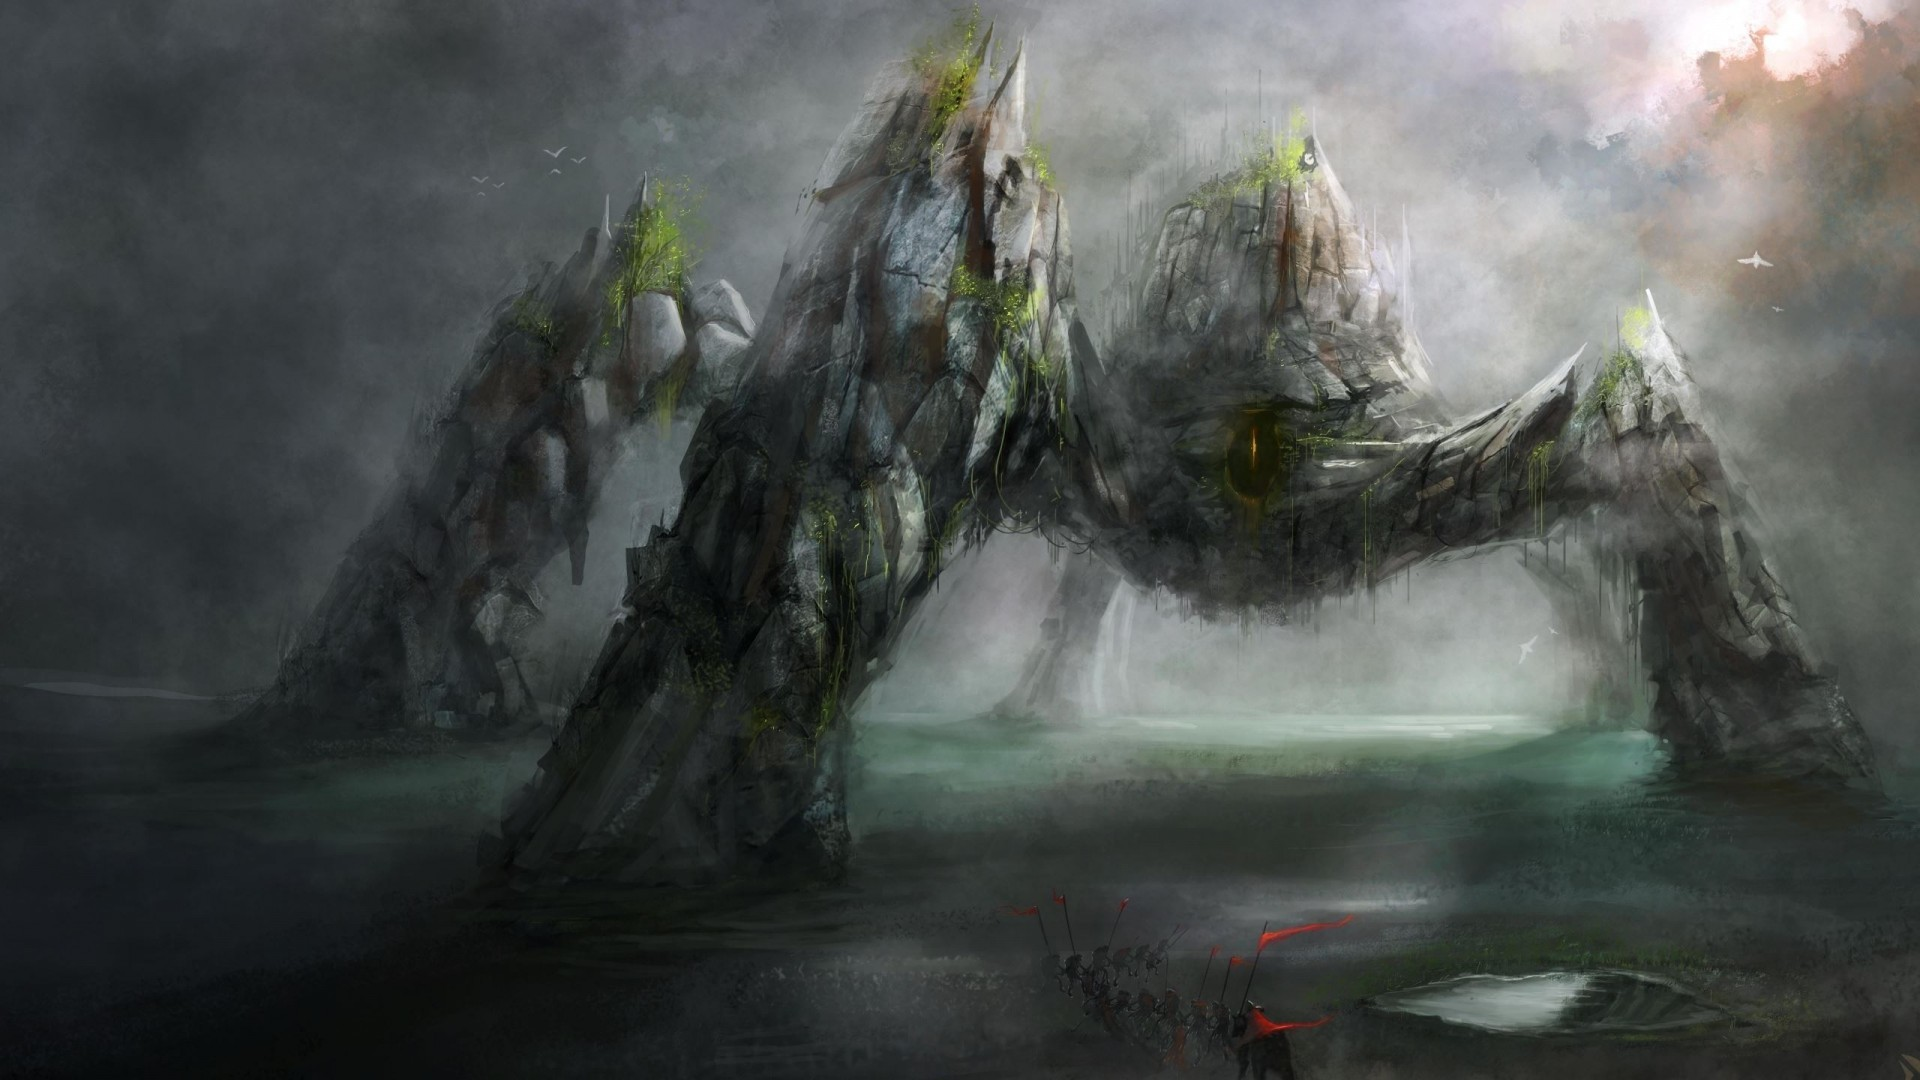 Stone Monster, Epic Battle (1080p) – Wallpaper – ImgPrix